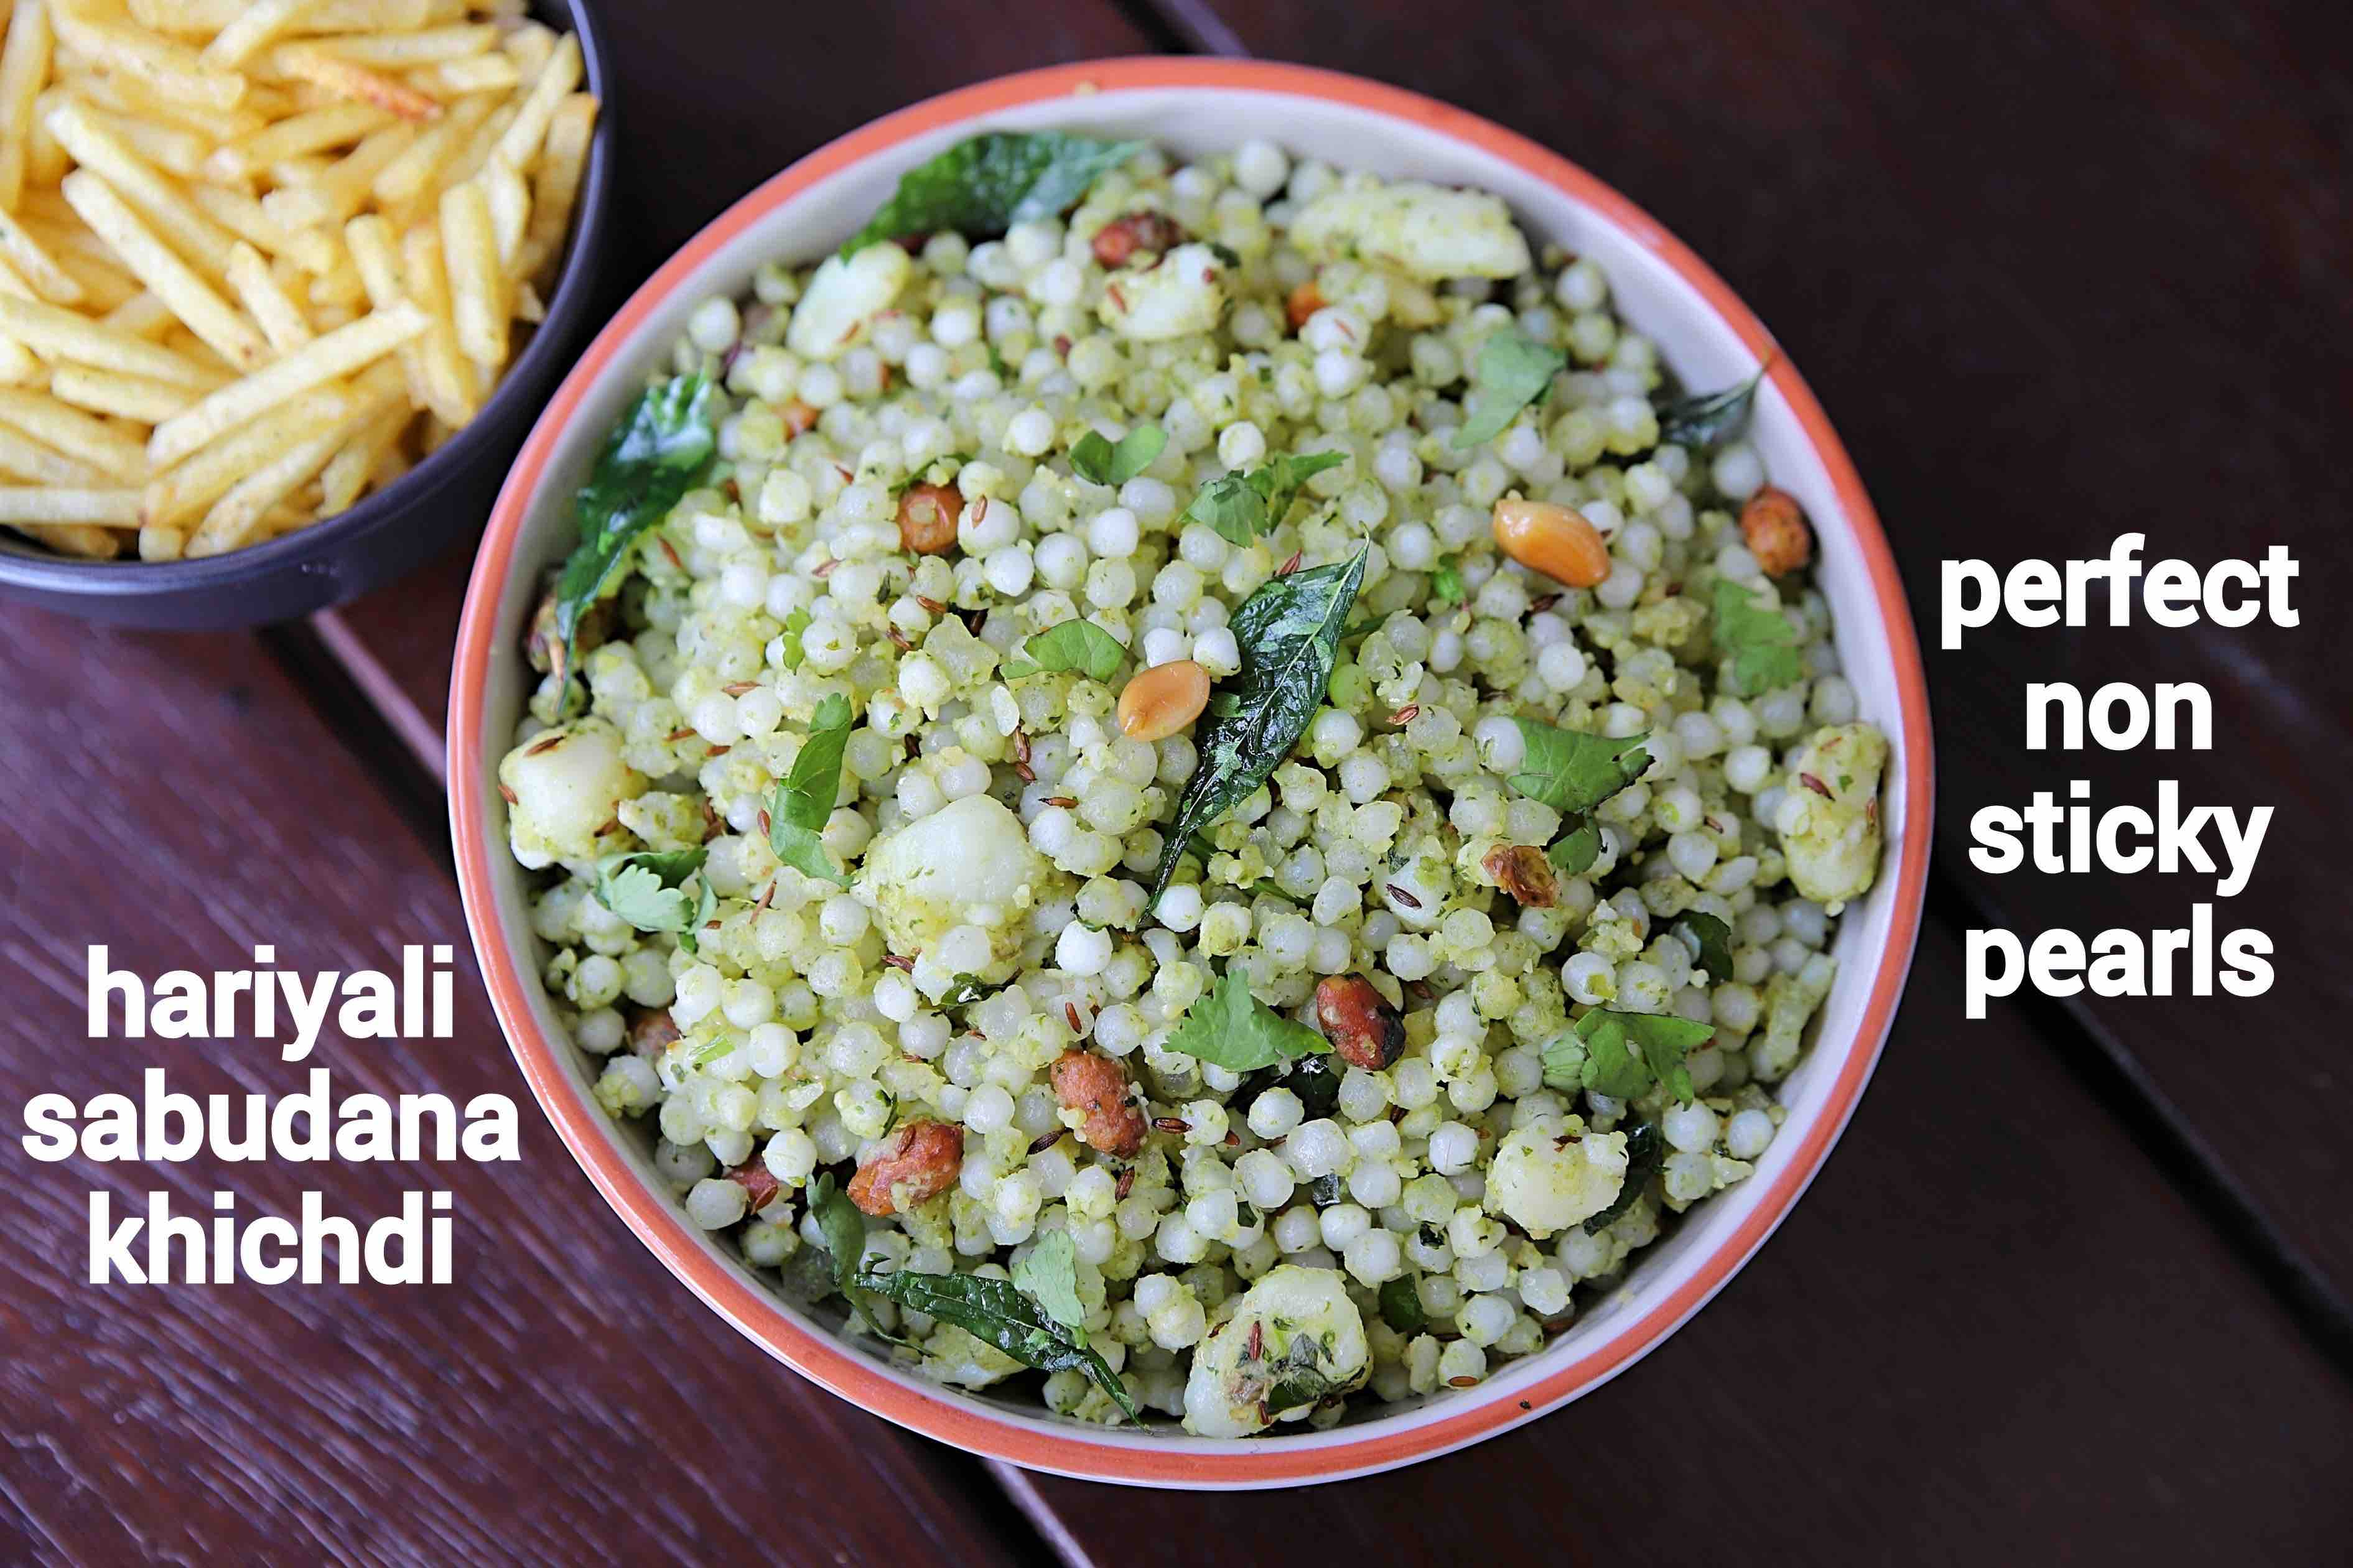 hariyali sabudana khichdi recipe   green sabudana khichdi